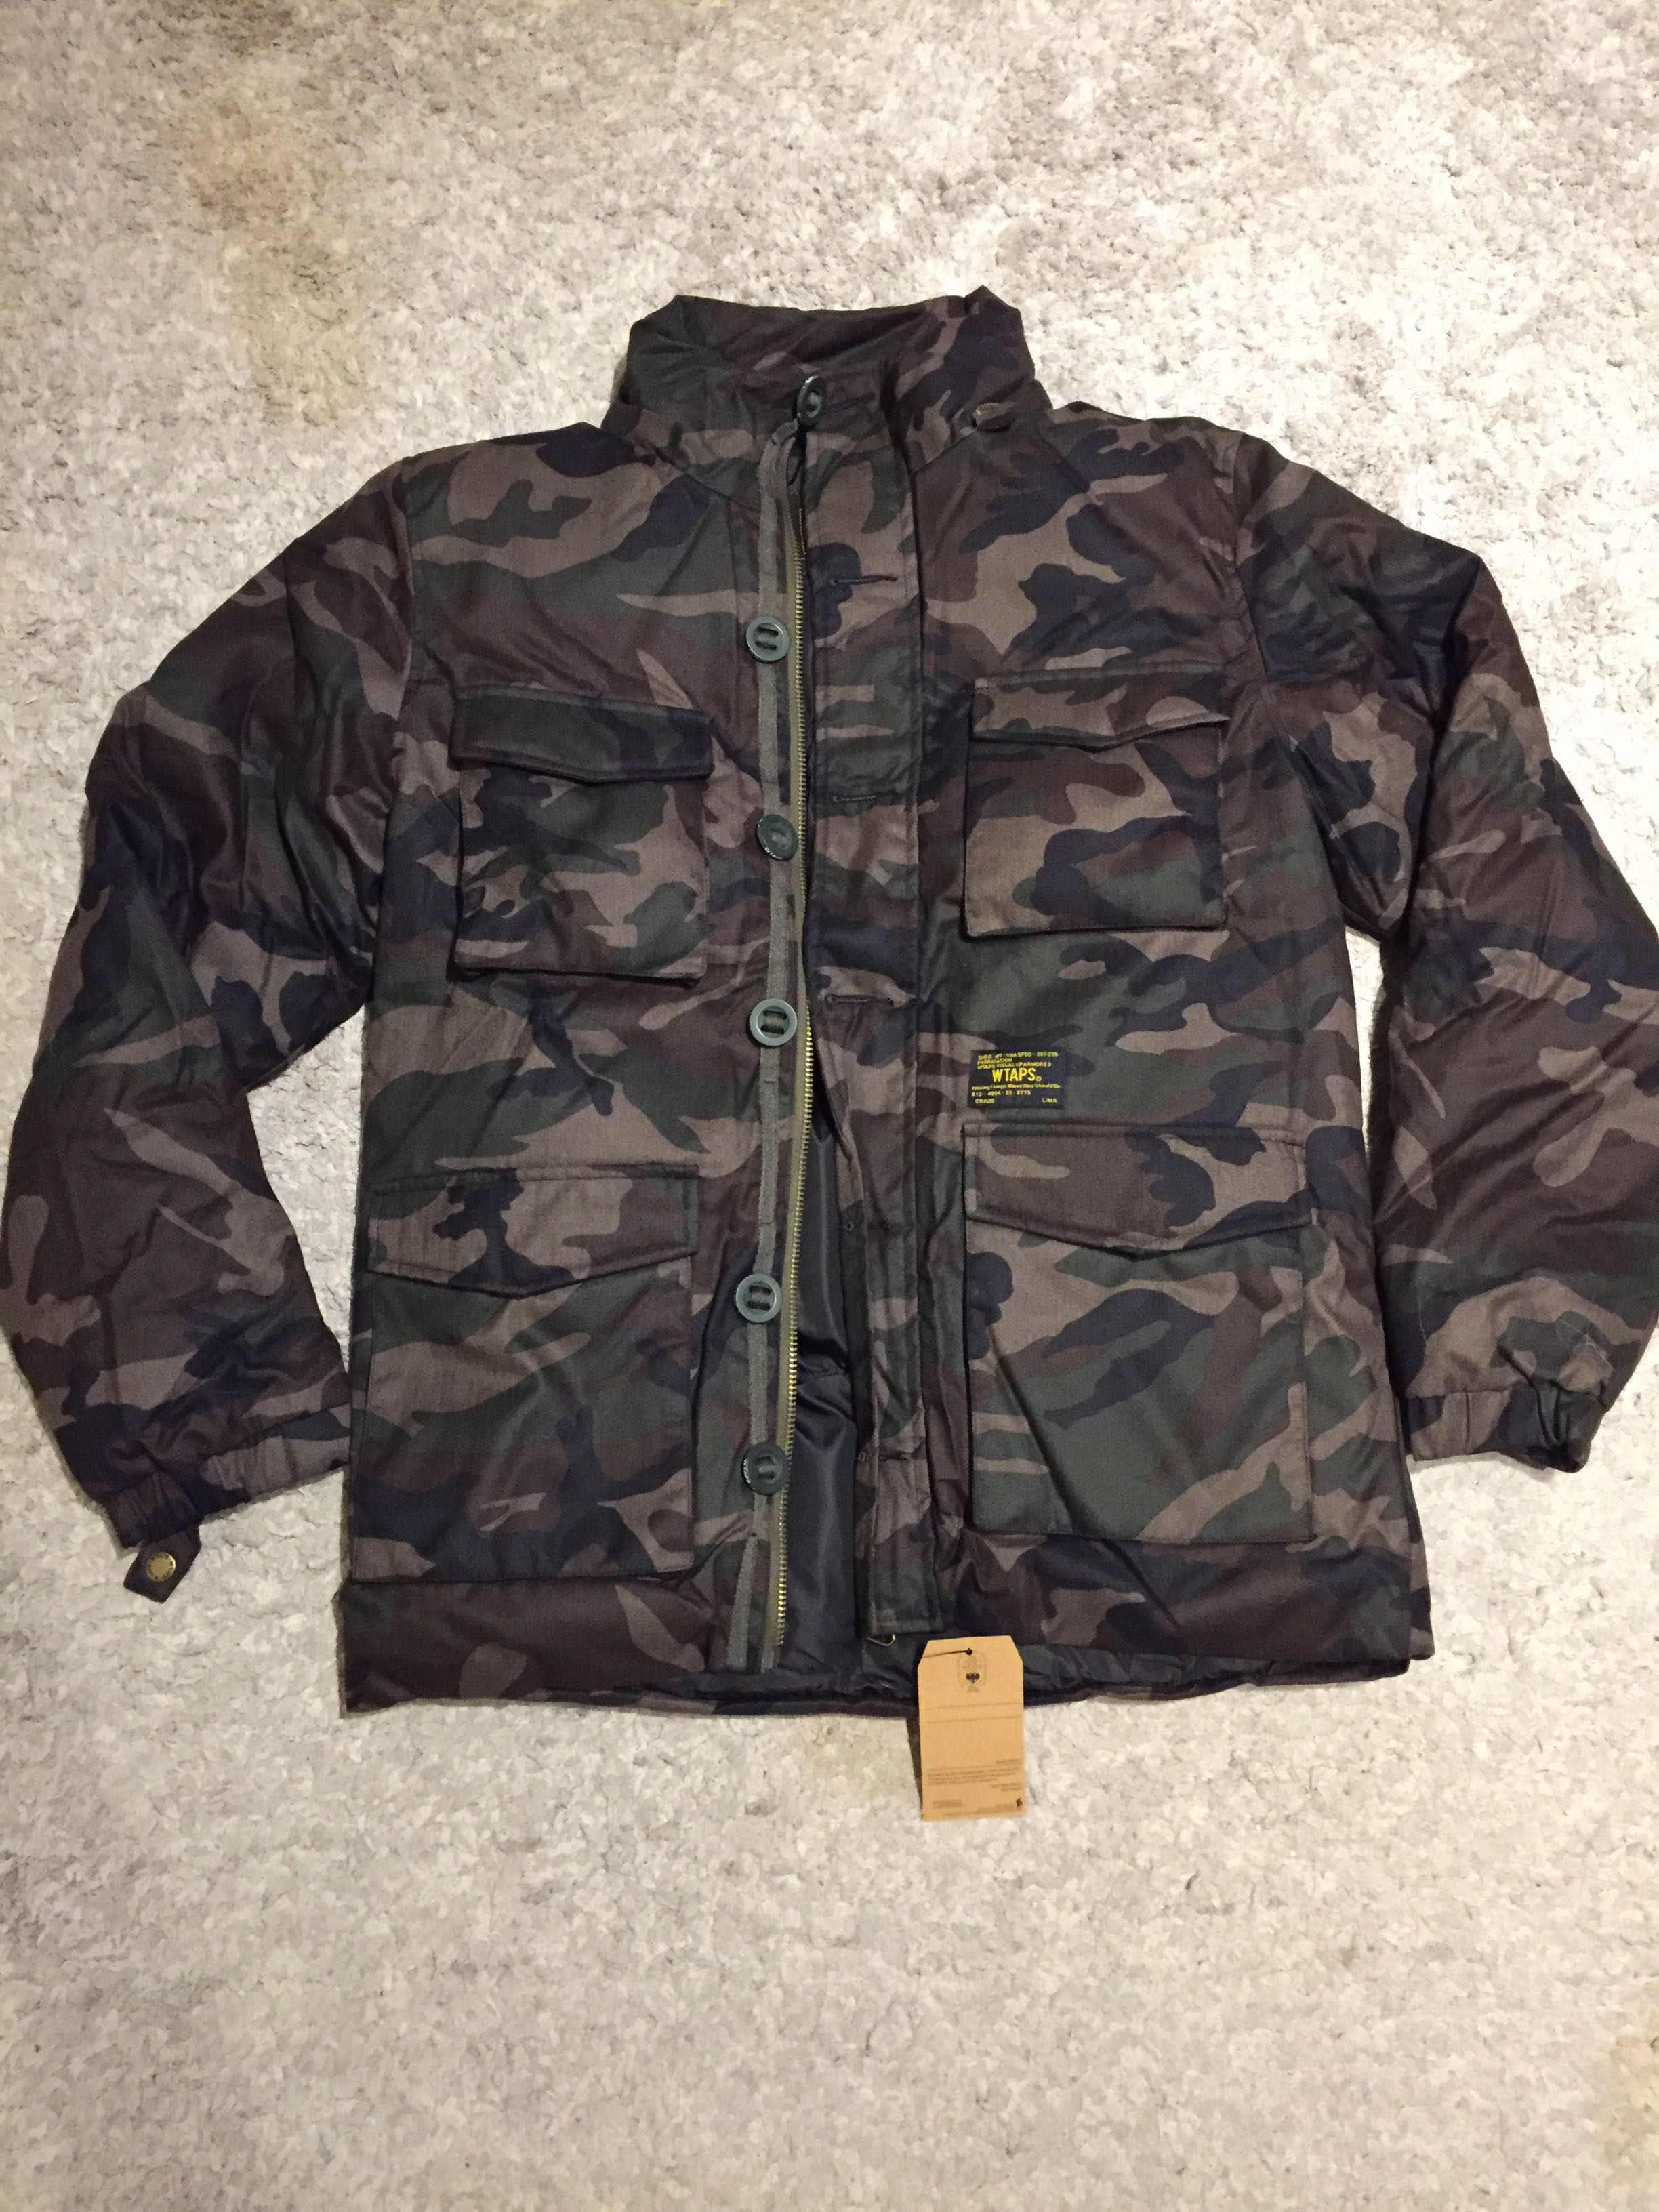 e10536f257d8b WTAPS camo military winter jacket, Men's Fashion, Clothes, Tops on ...